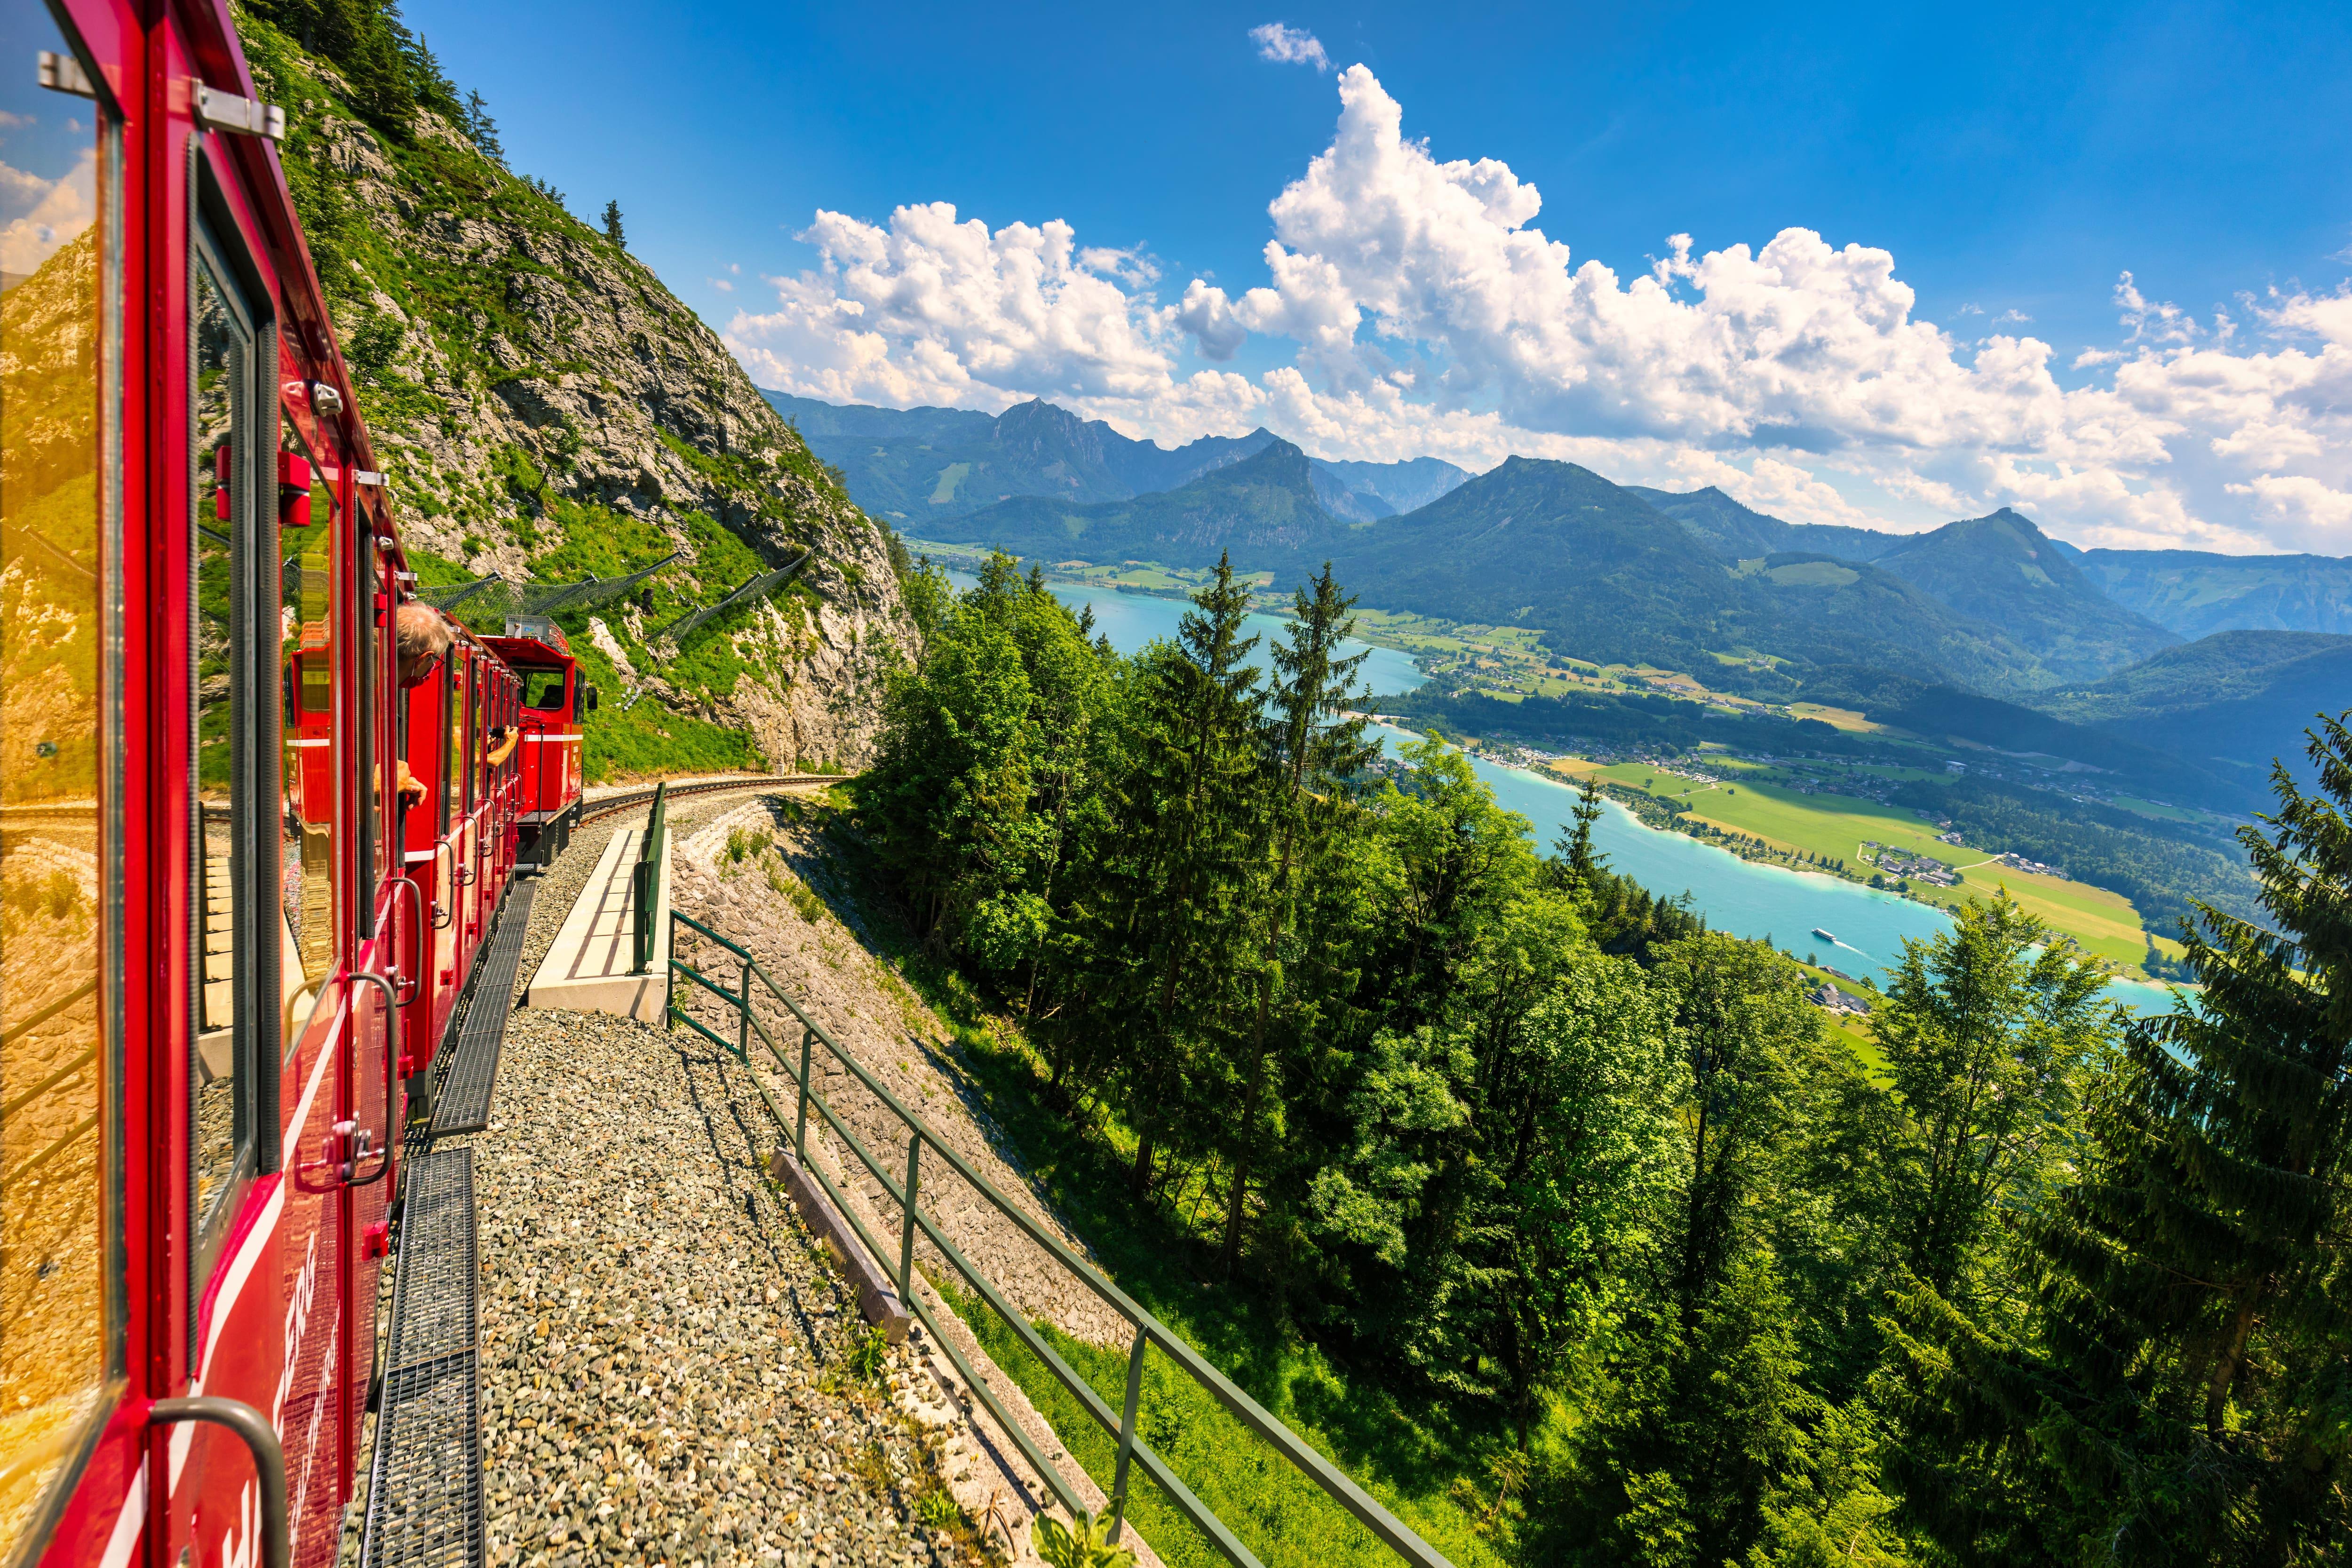 Schafberg mountain train